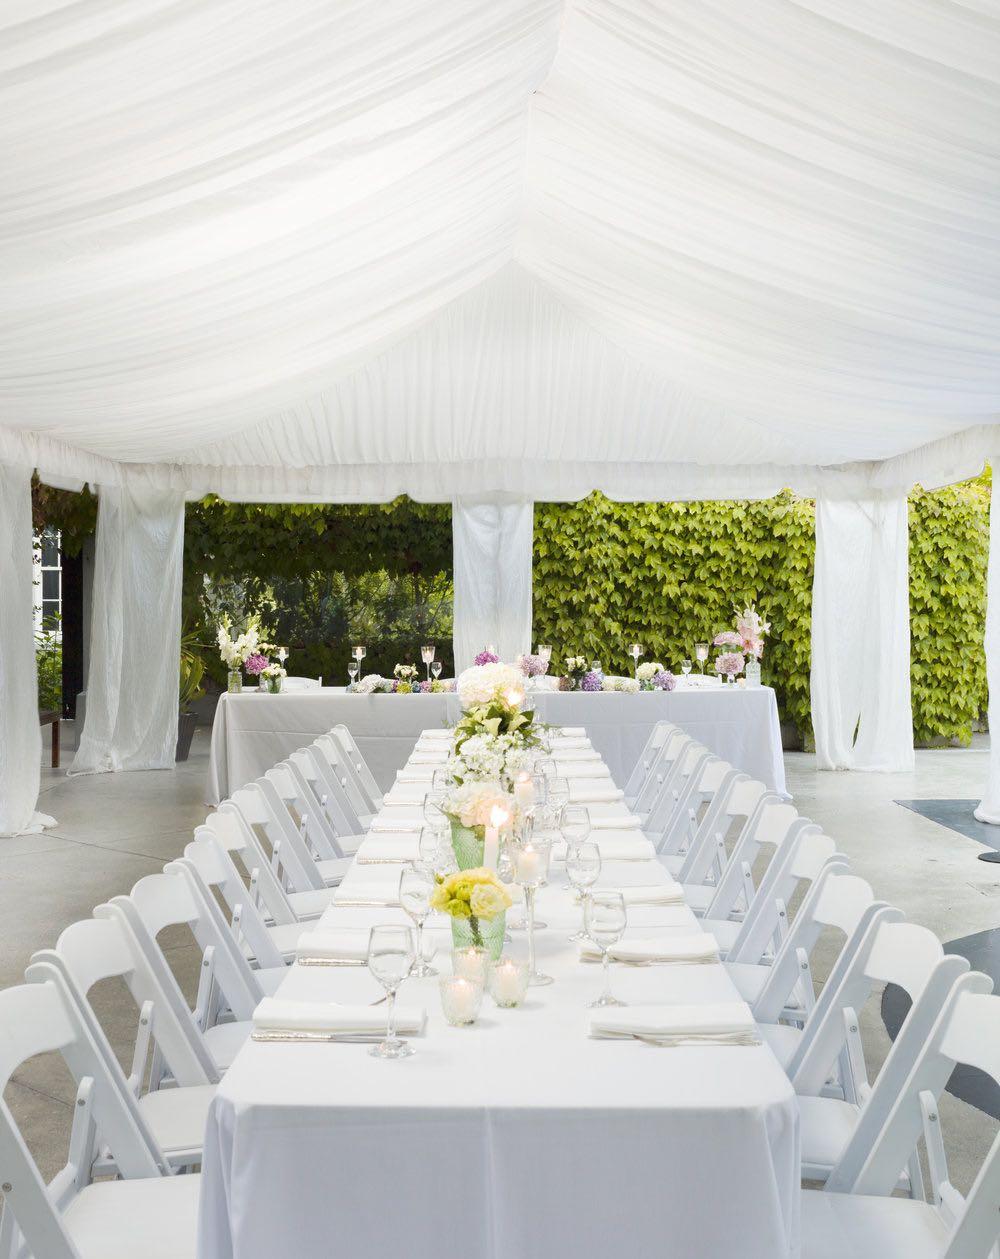 wellington wedding diner table